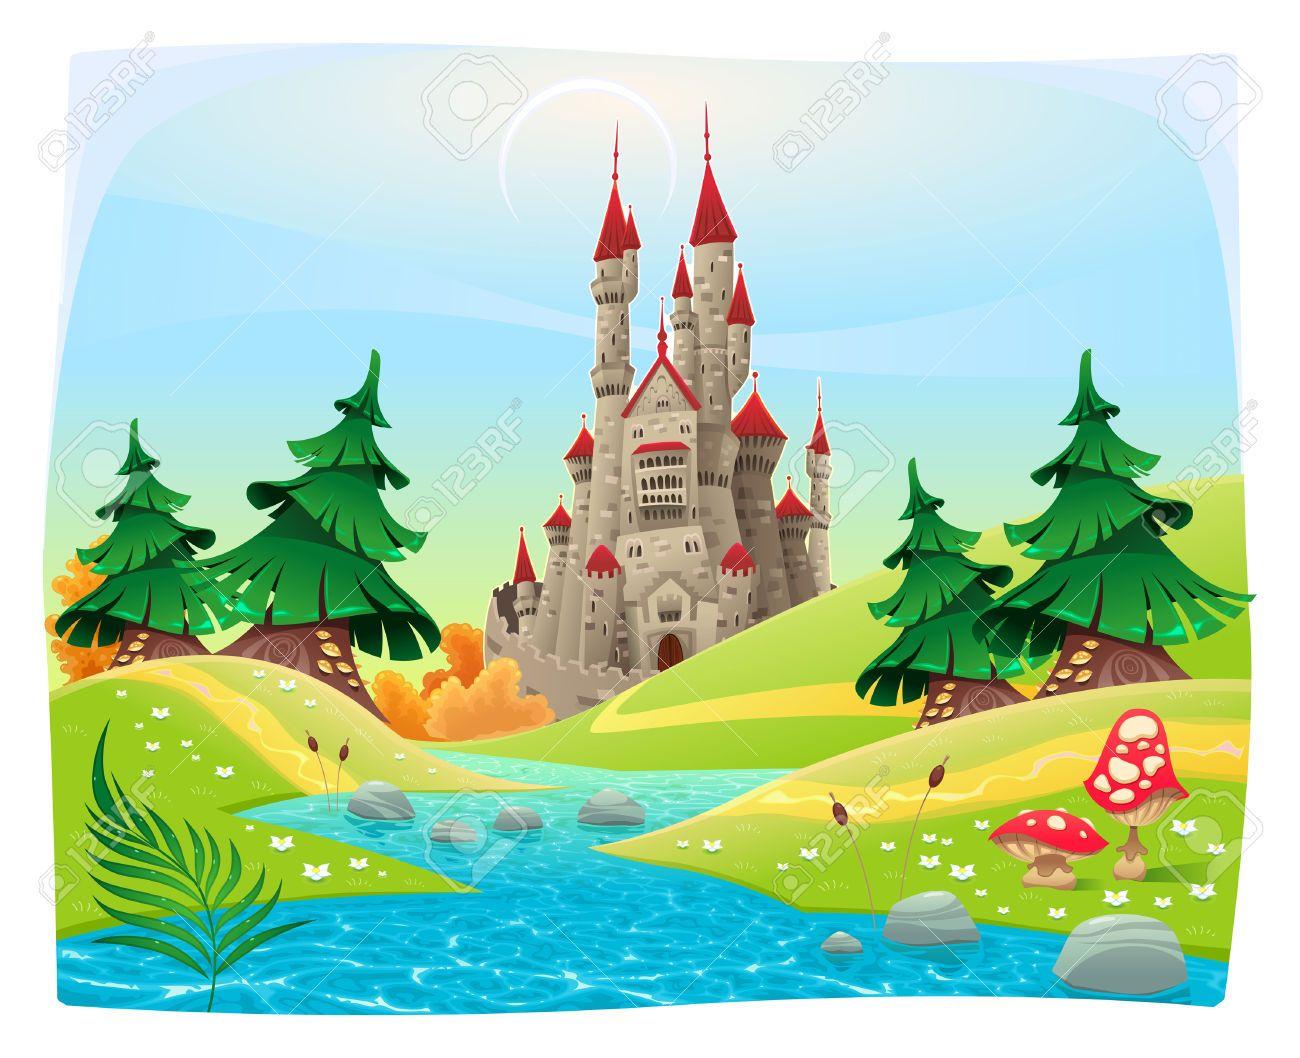 Clipart castle scenery. Mythological landscape with medieval